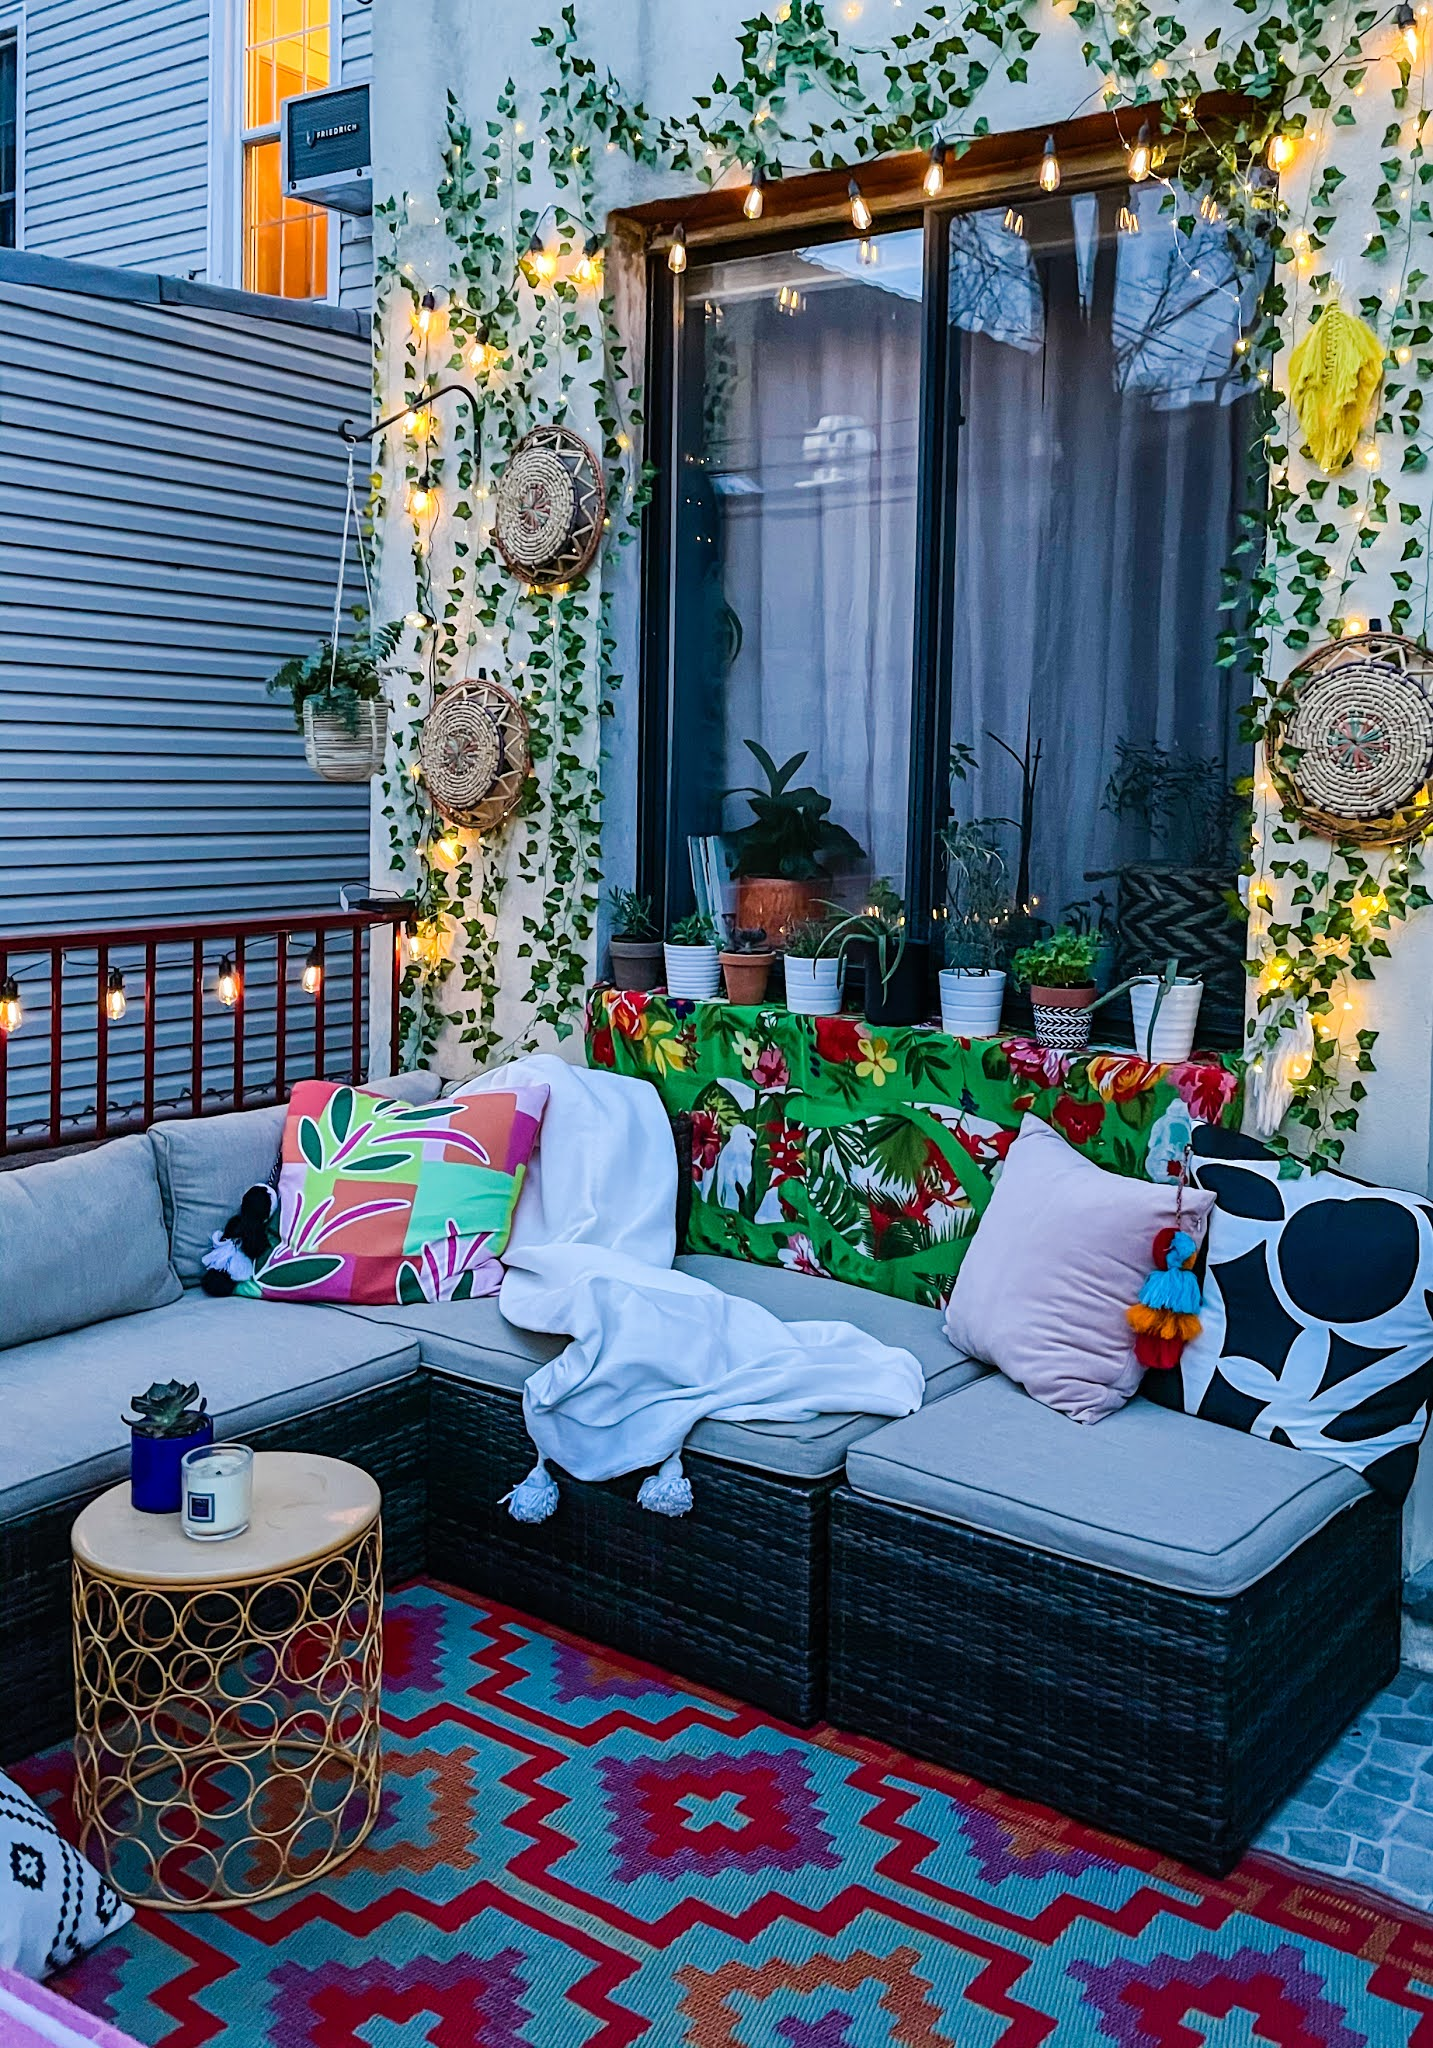 Renter-Friendly Patio Decor,  patio decor, faux ivy wall, command outdoor light clips, patio decor ideas, faux ivy wall diy, small space patio decor, small patio design ideas, renter friendly patio ideas, fairy lights patio ideas, small space outdoor decor